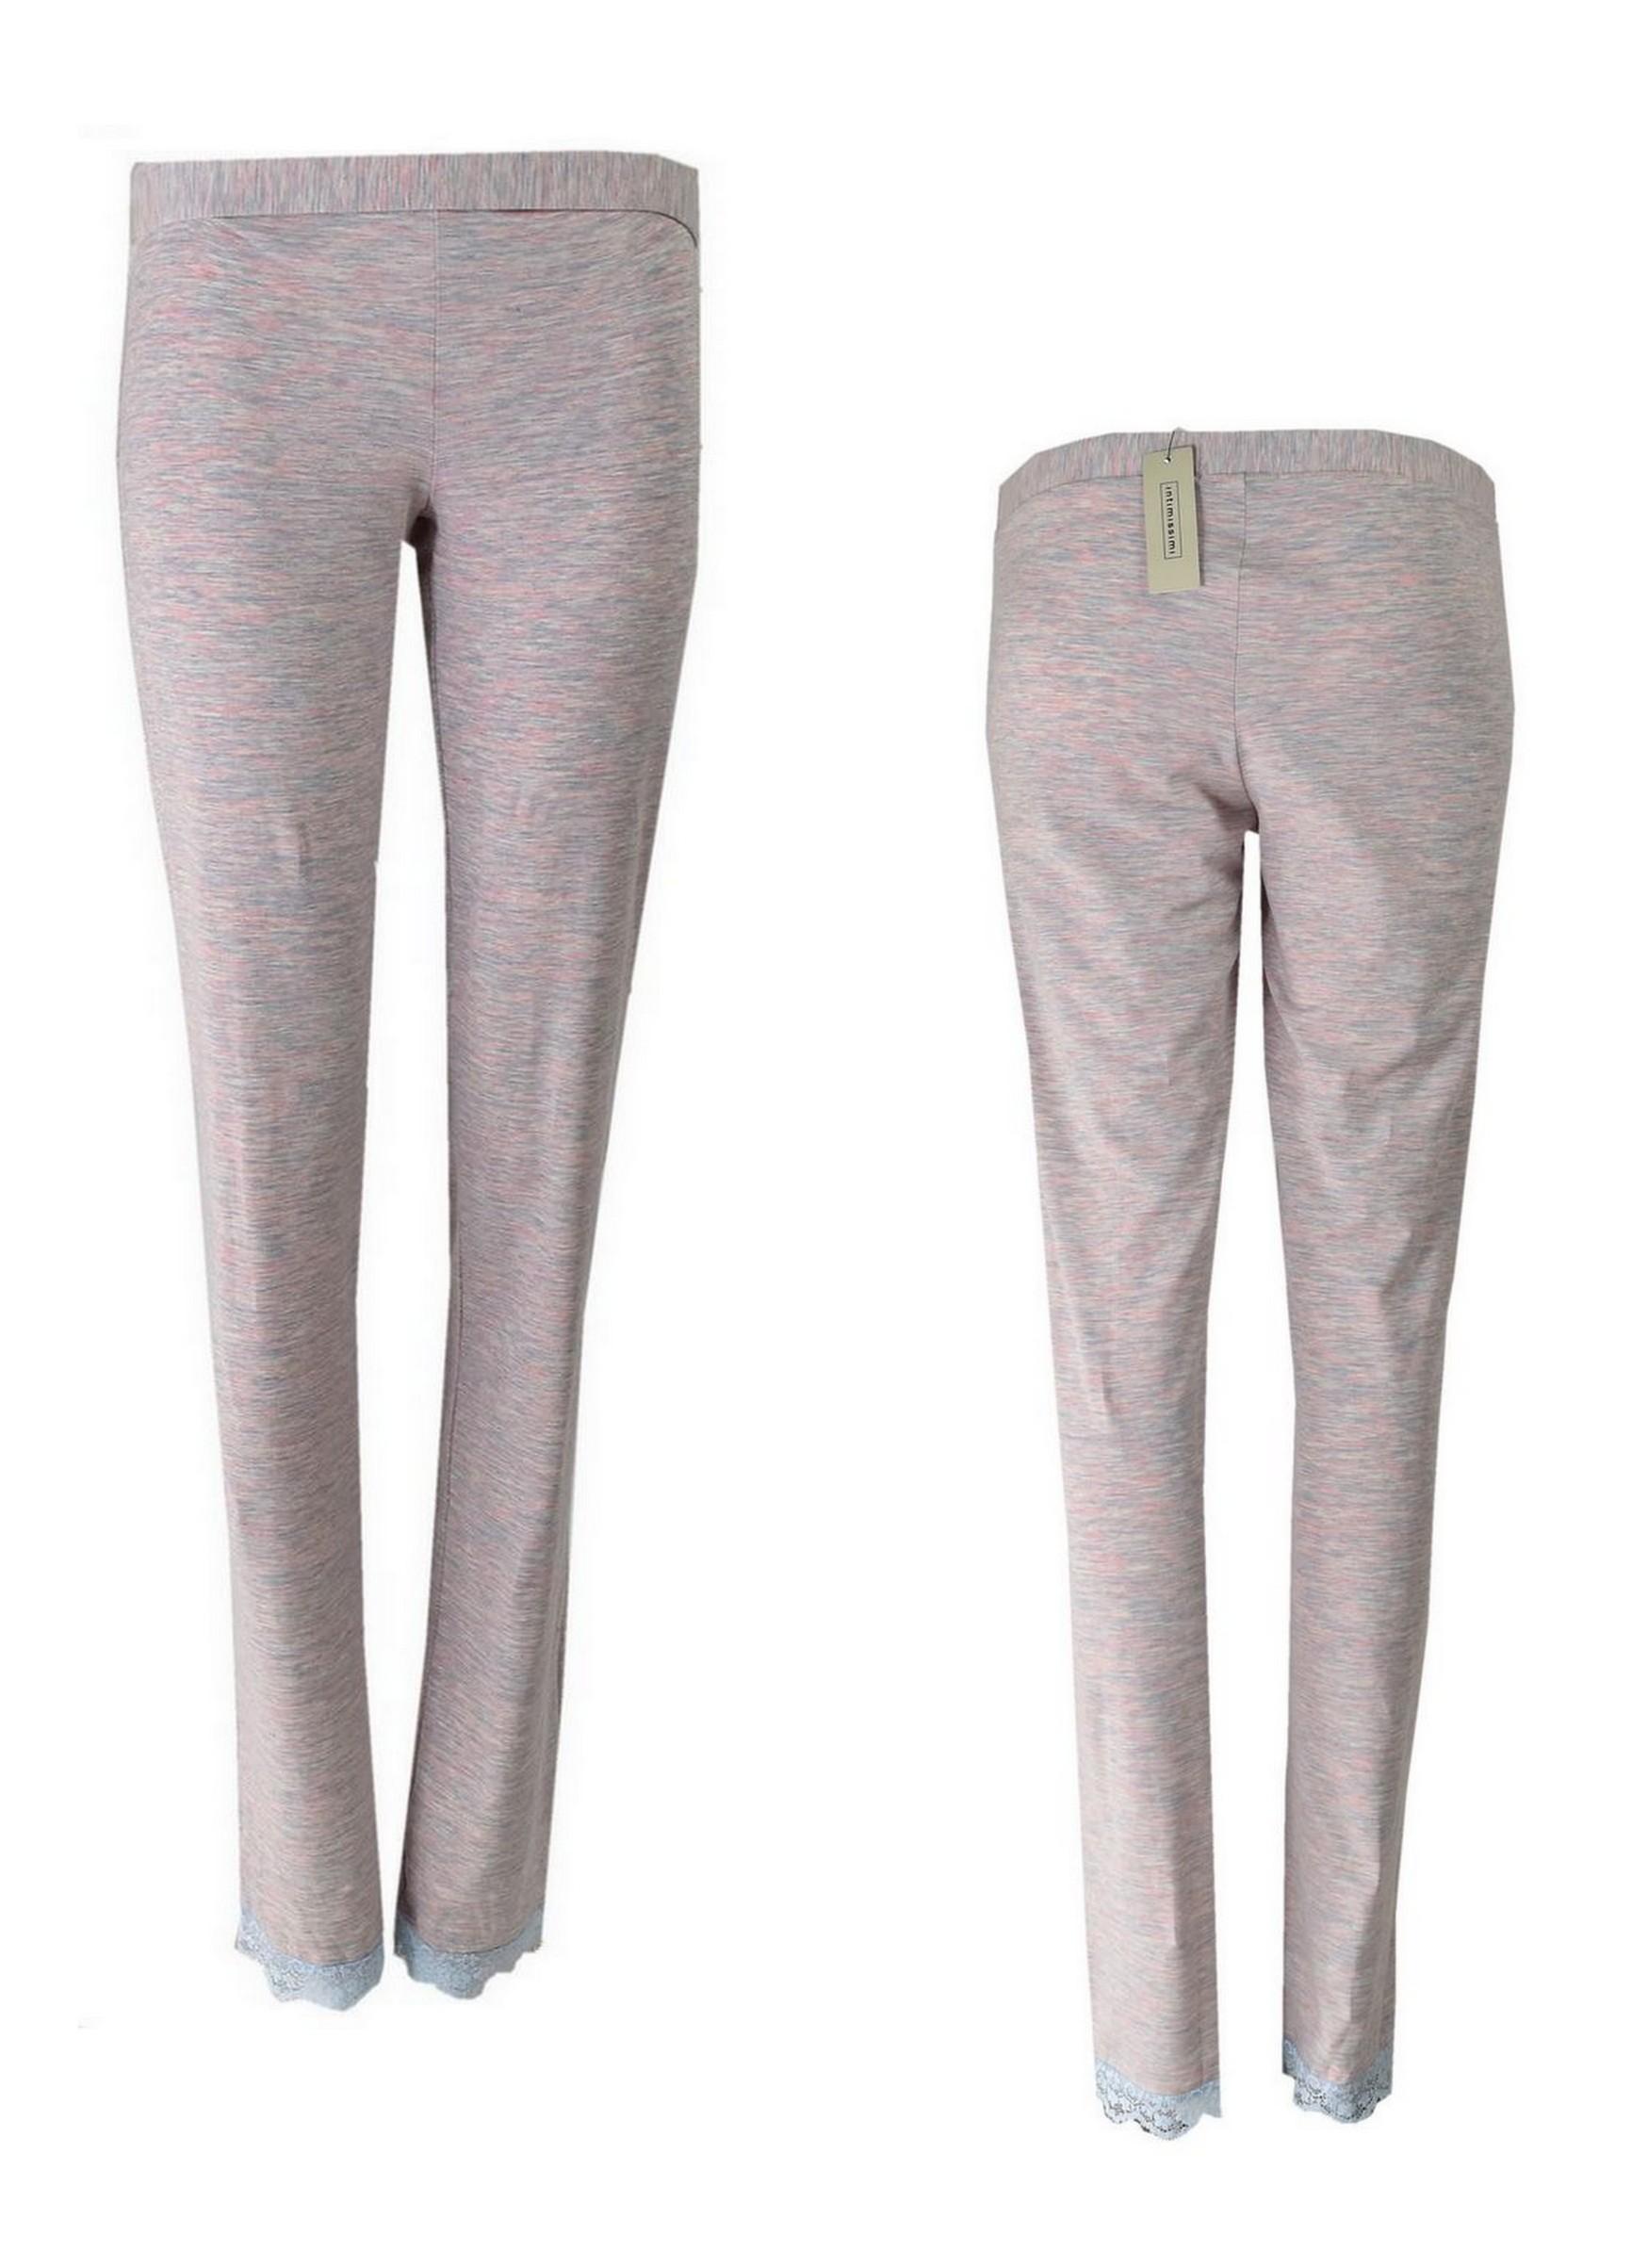 Intimissimi pyžamo nohavice retro bavlna čipky M